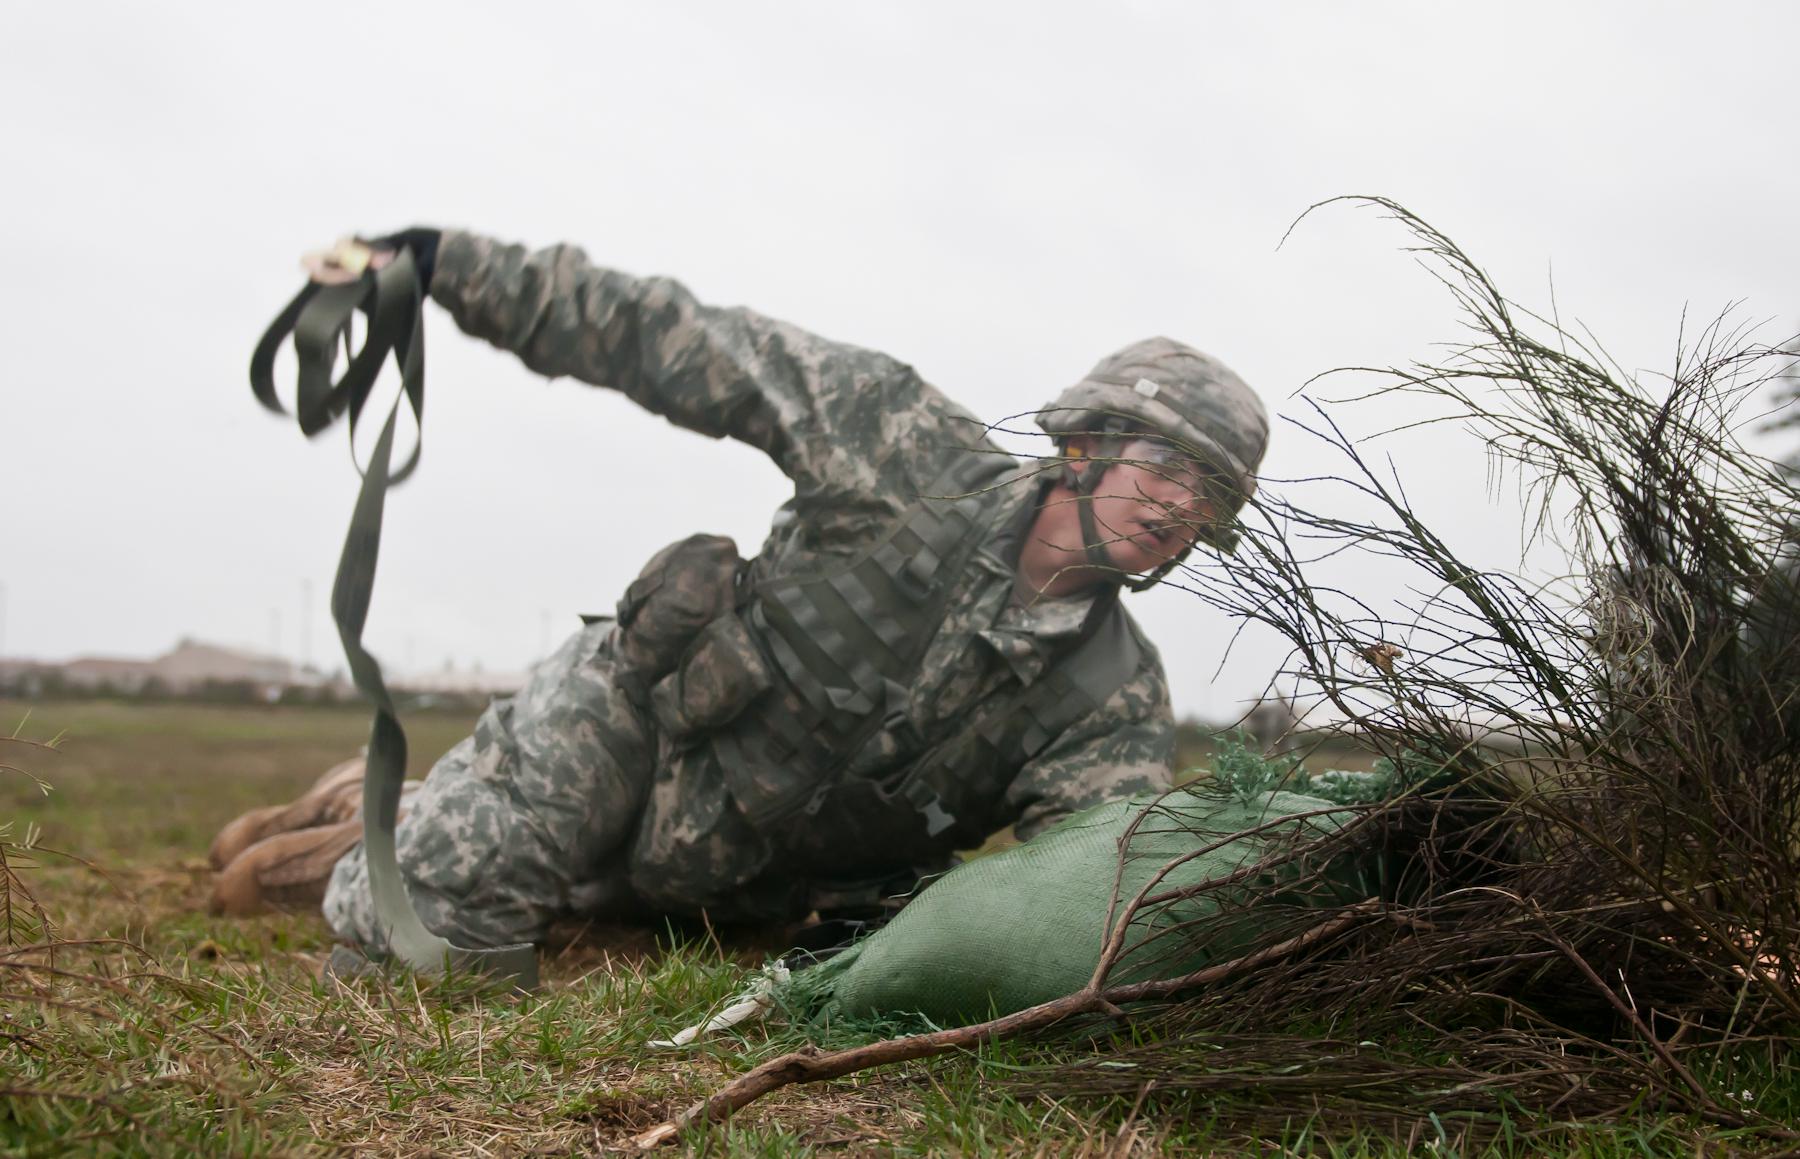 Multifunctional medical battalion field